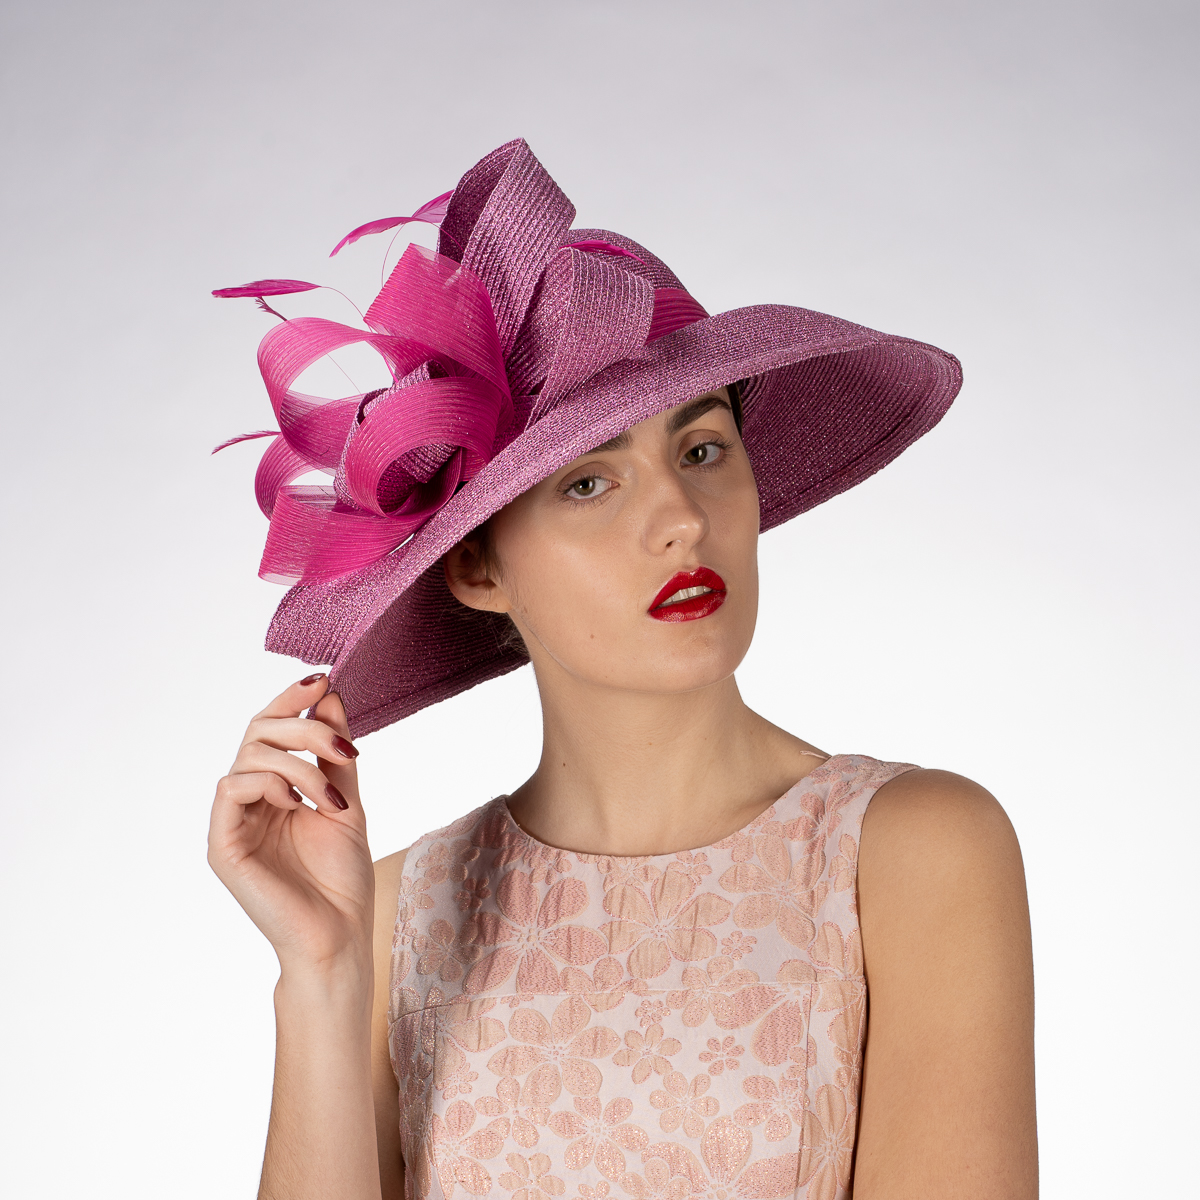 86036c8365 Pink Color Metallic Wide-Brimmed Church Hats - Sun Yorkos